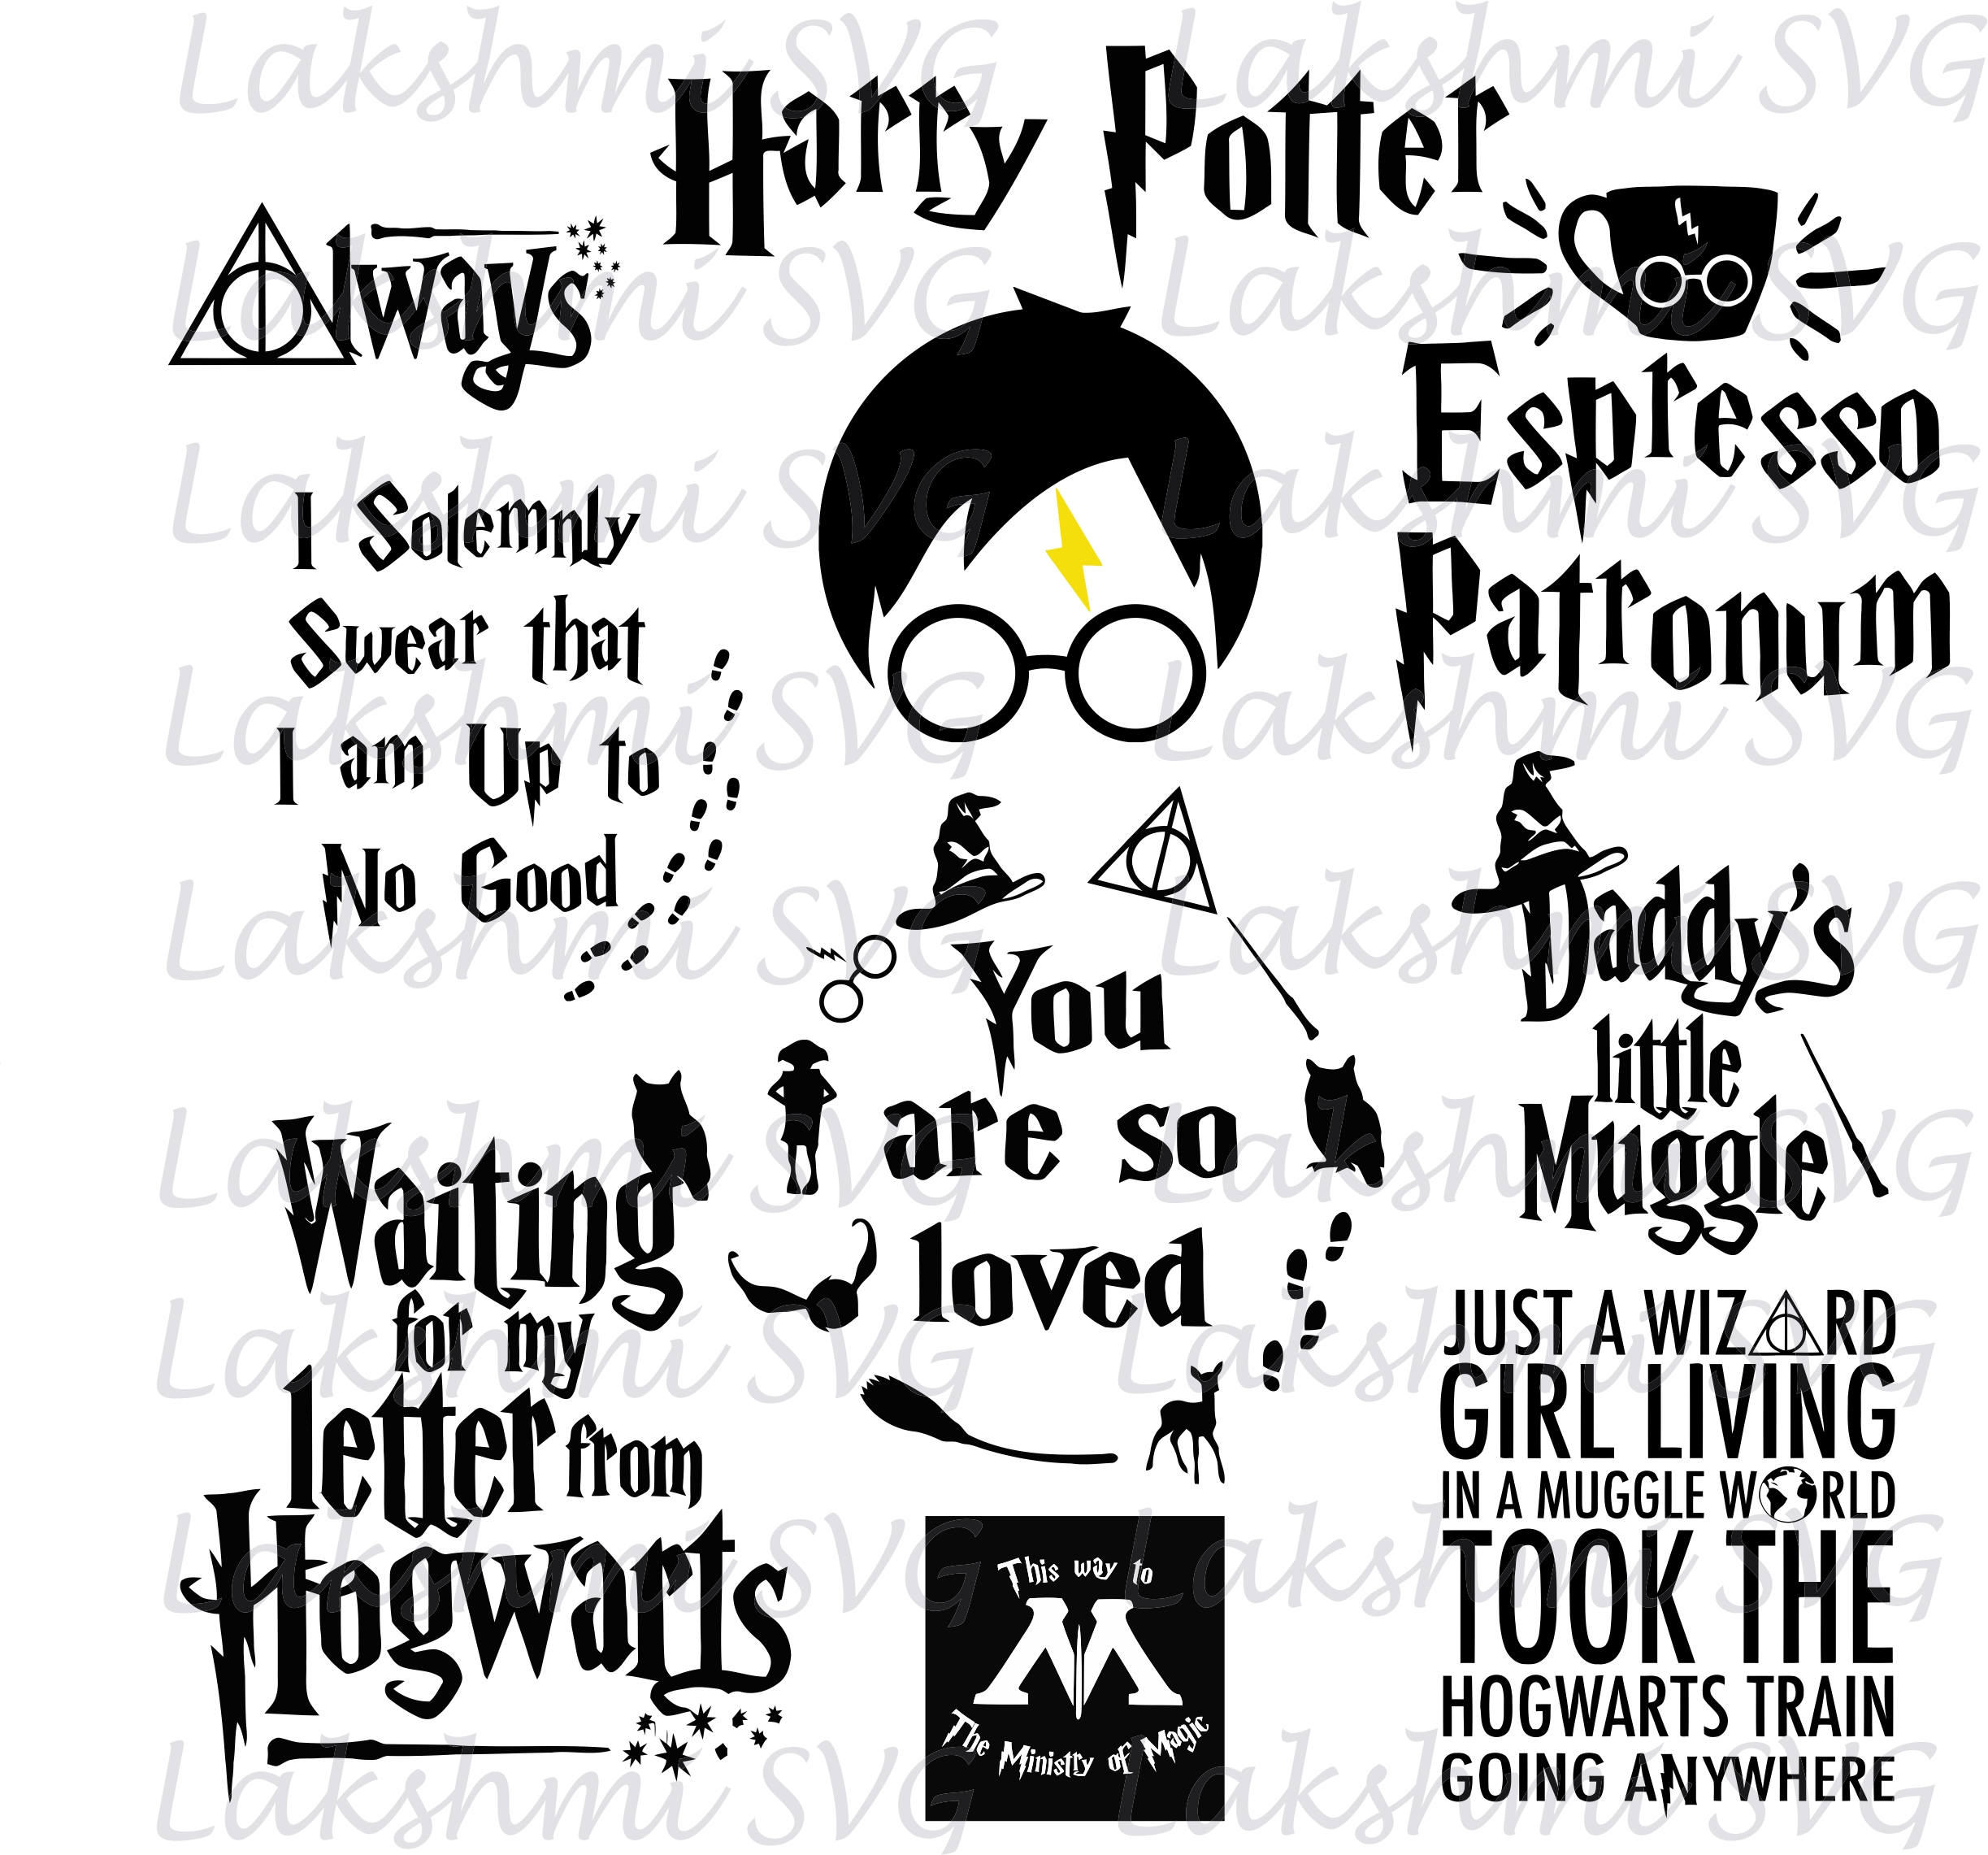 Download Harry Potter svg files Harry Potter svg quotes harry potter